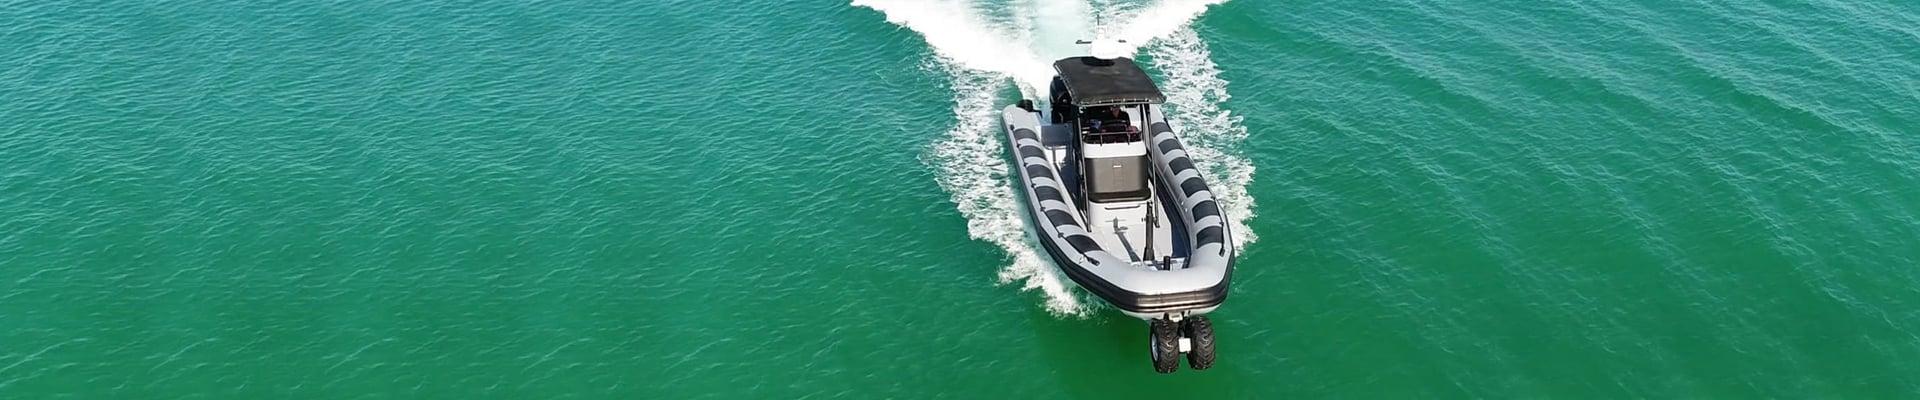 header-4wd-amphibious-9.8m-professional